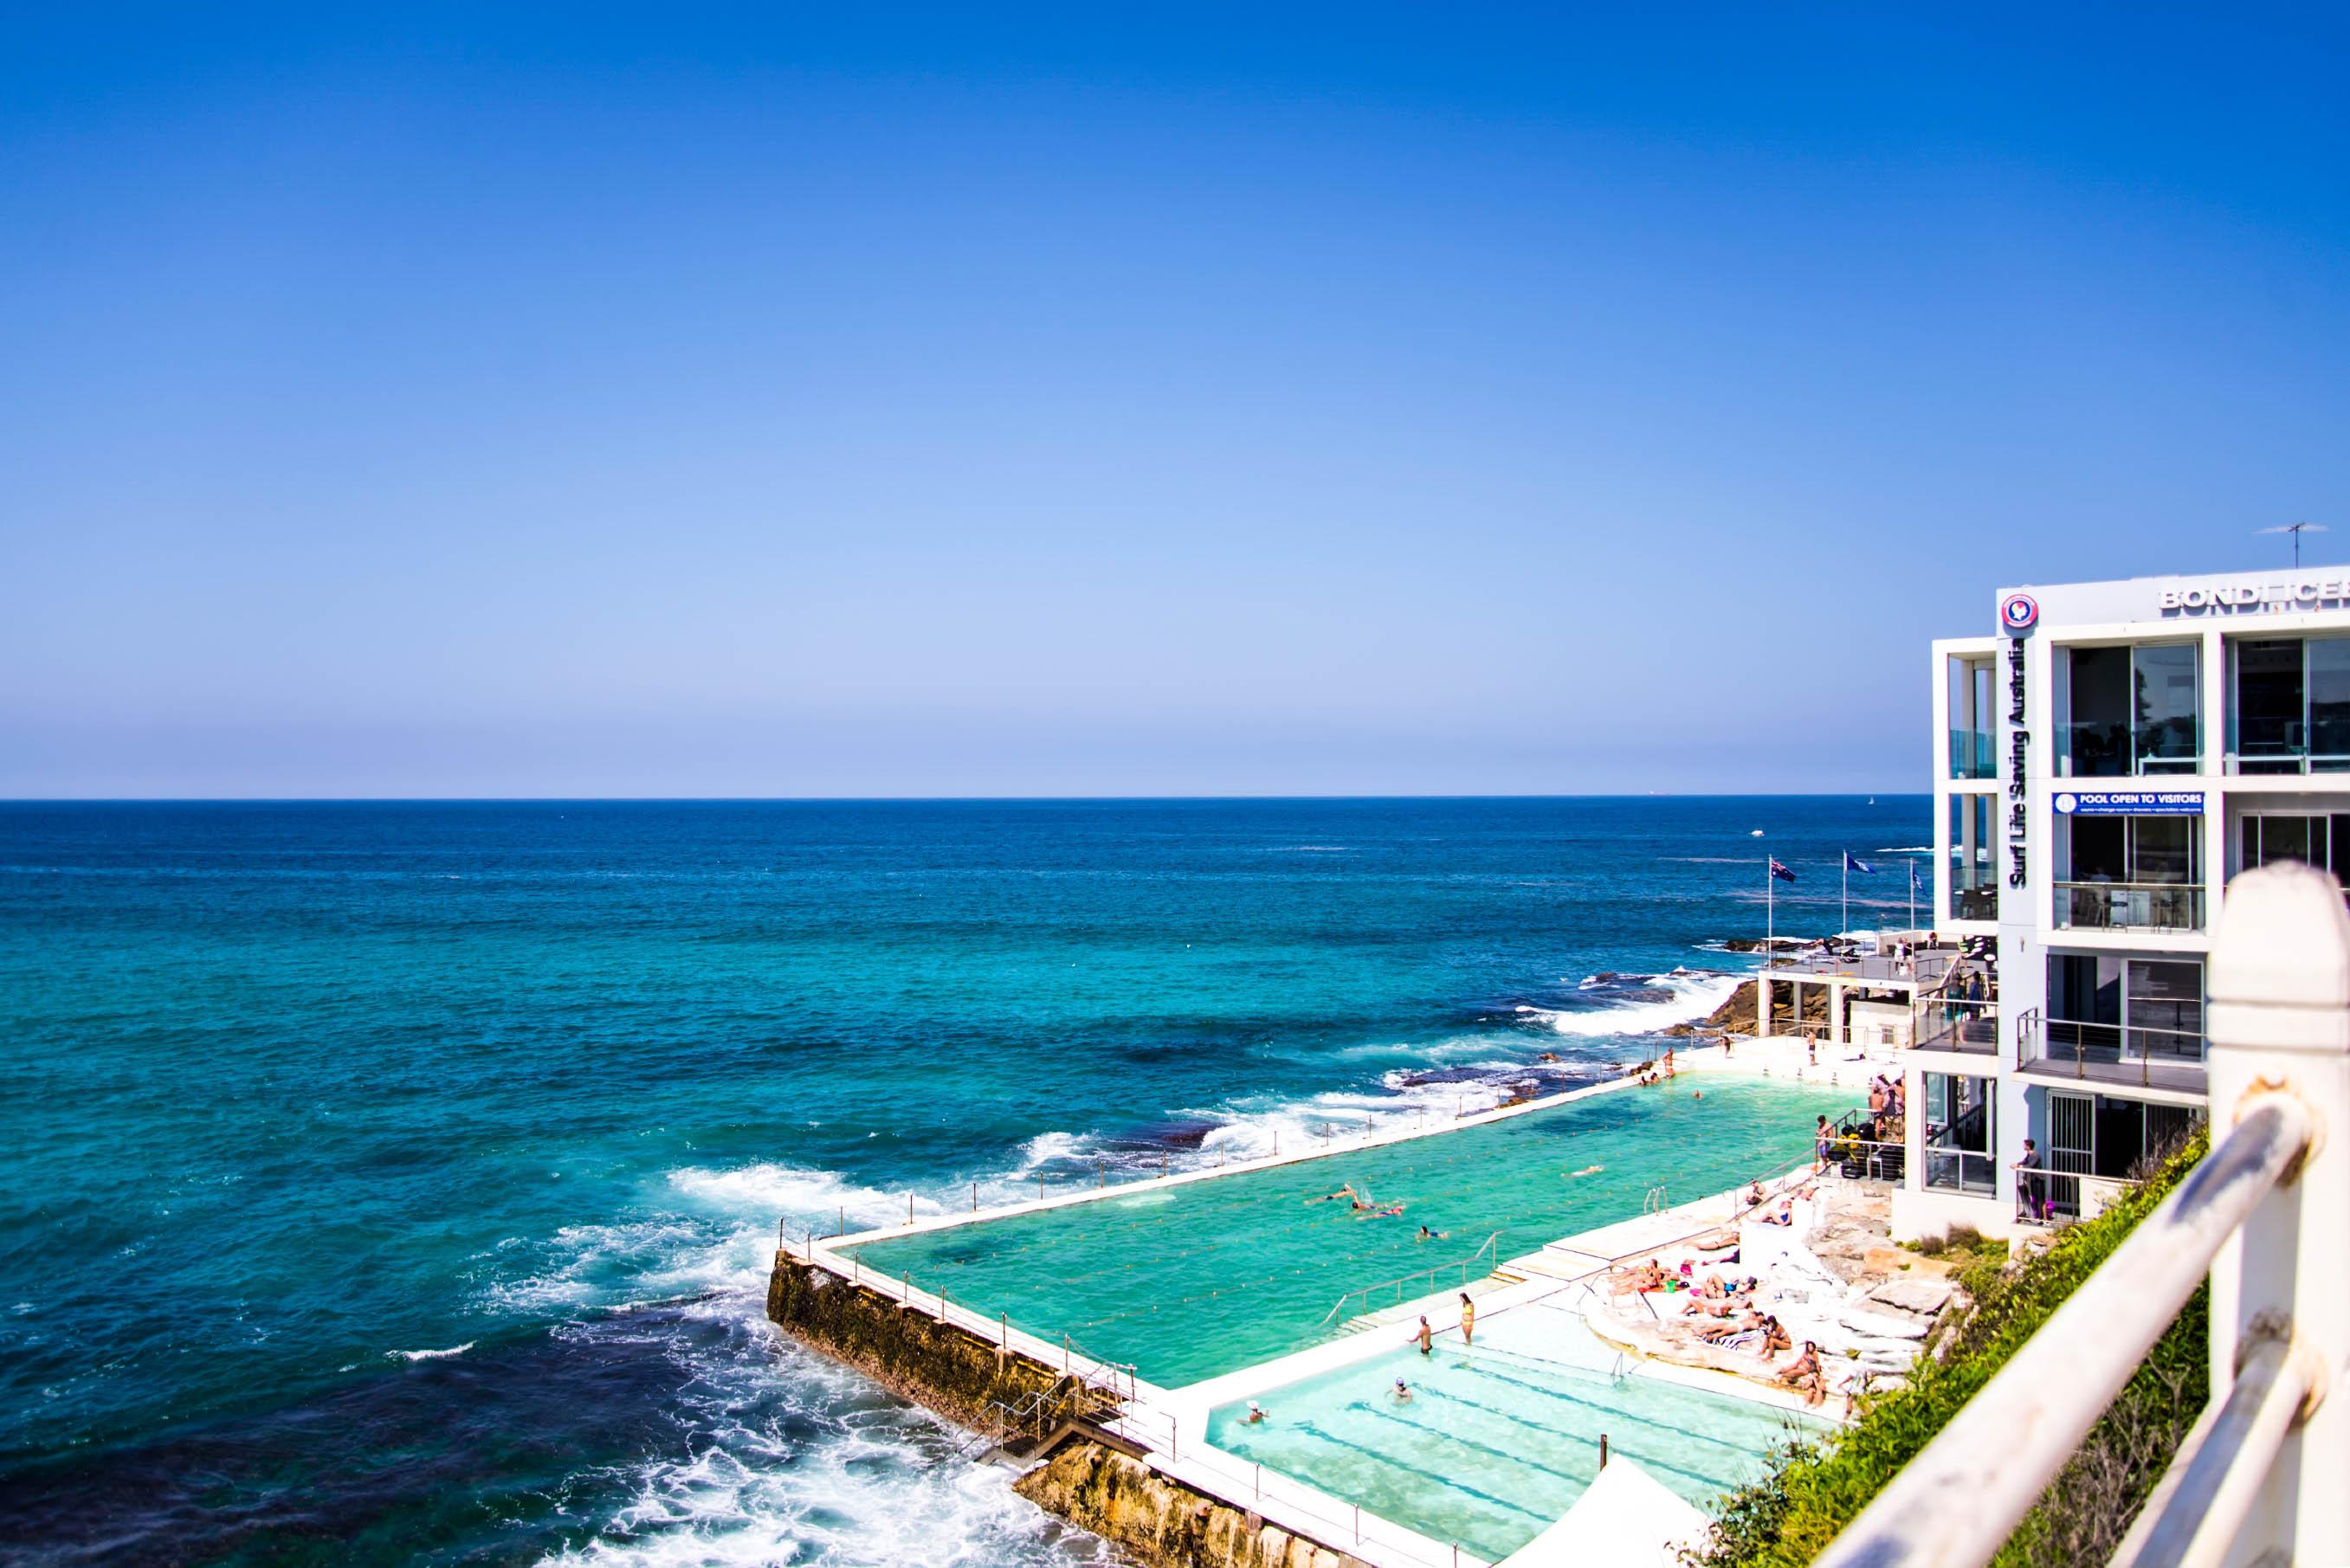 Sydney Tipps, der legendäre Pool am Bondi Beach